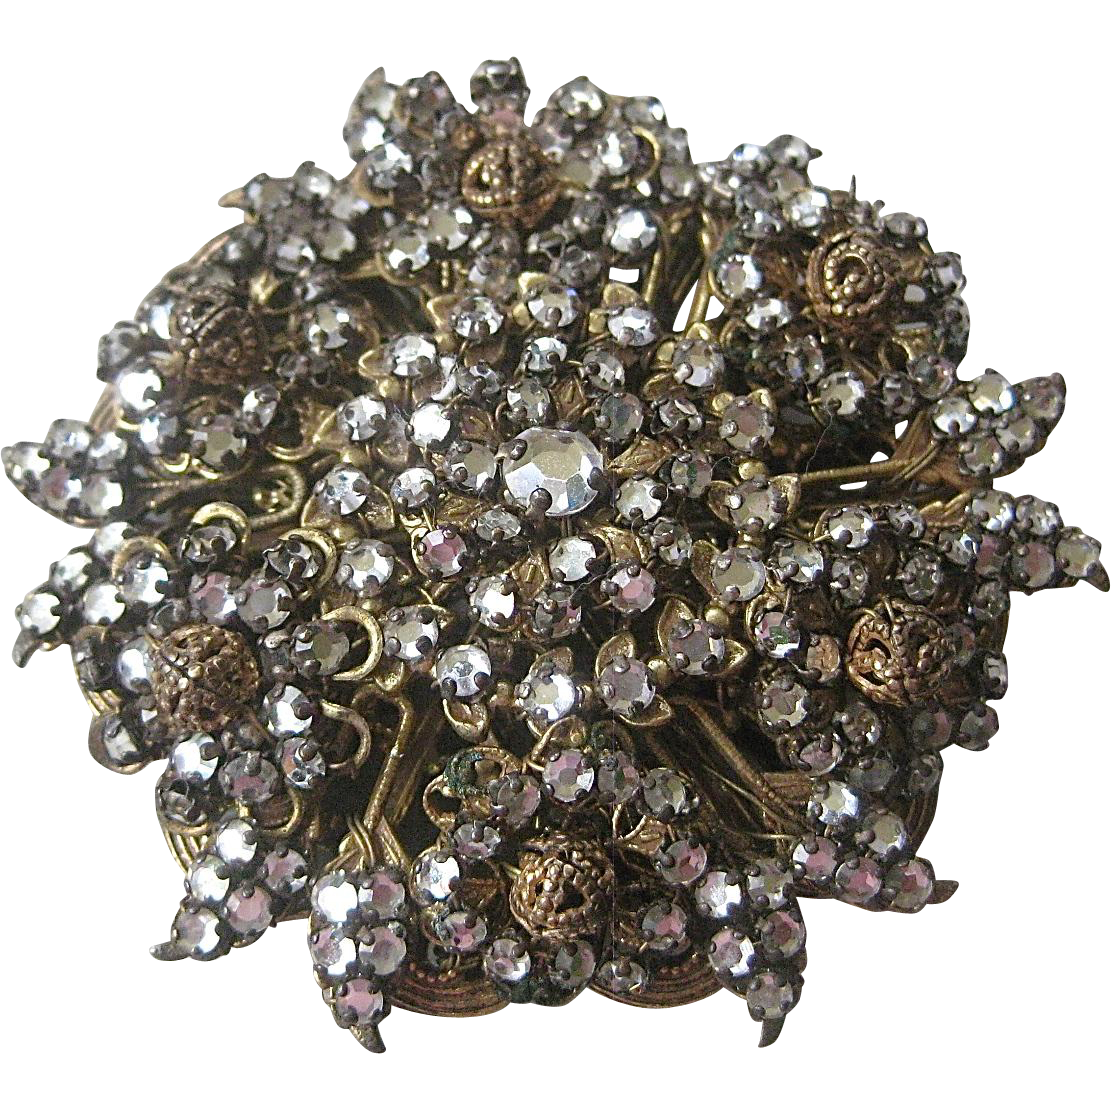 Large Unsigned Miriam Haskell Rhinestone Brooch Pin